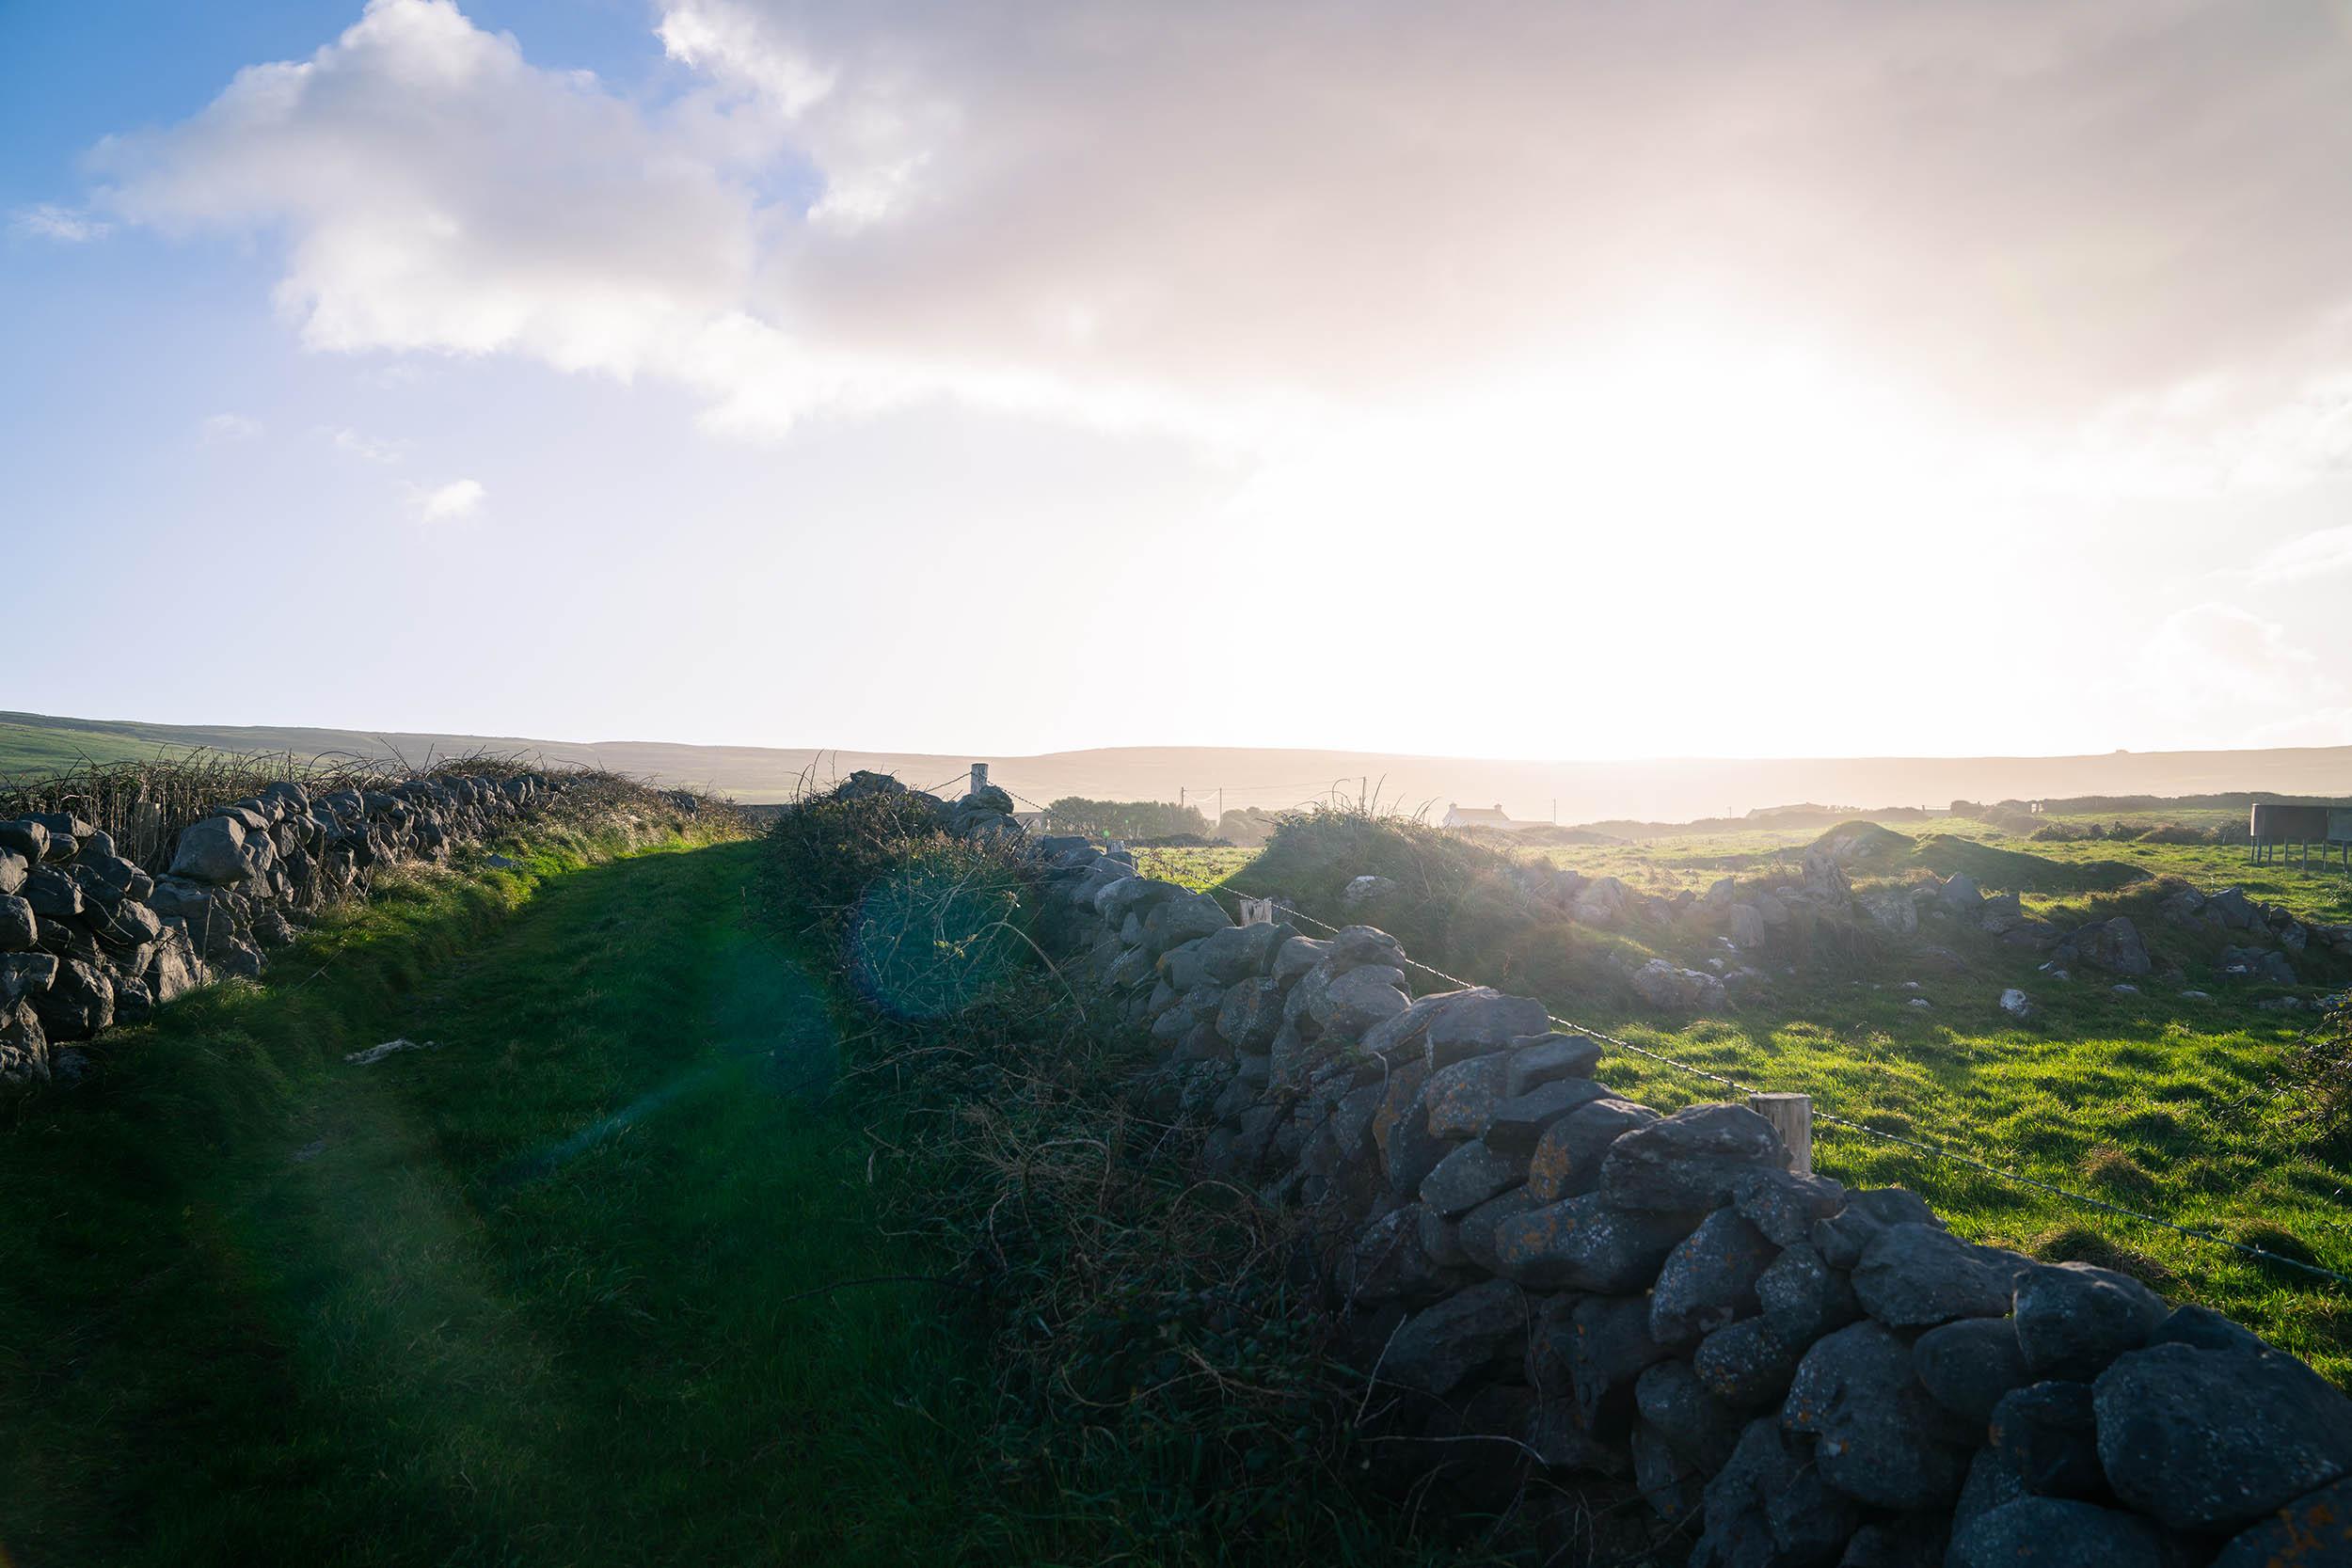 IRELAND_CLARE_FANORE_0001